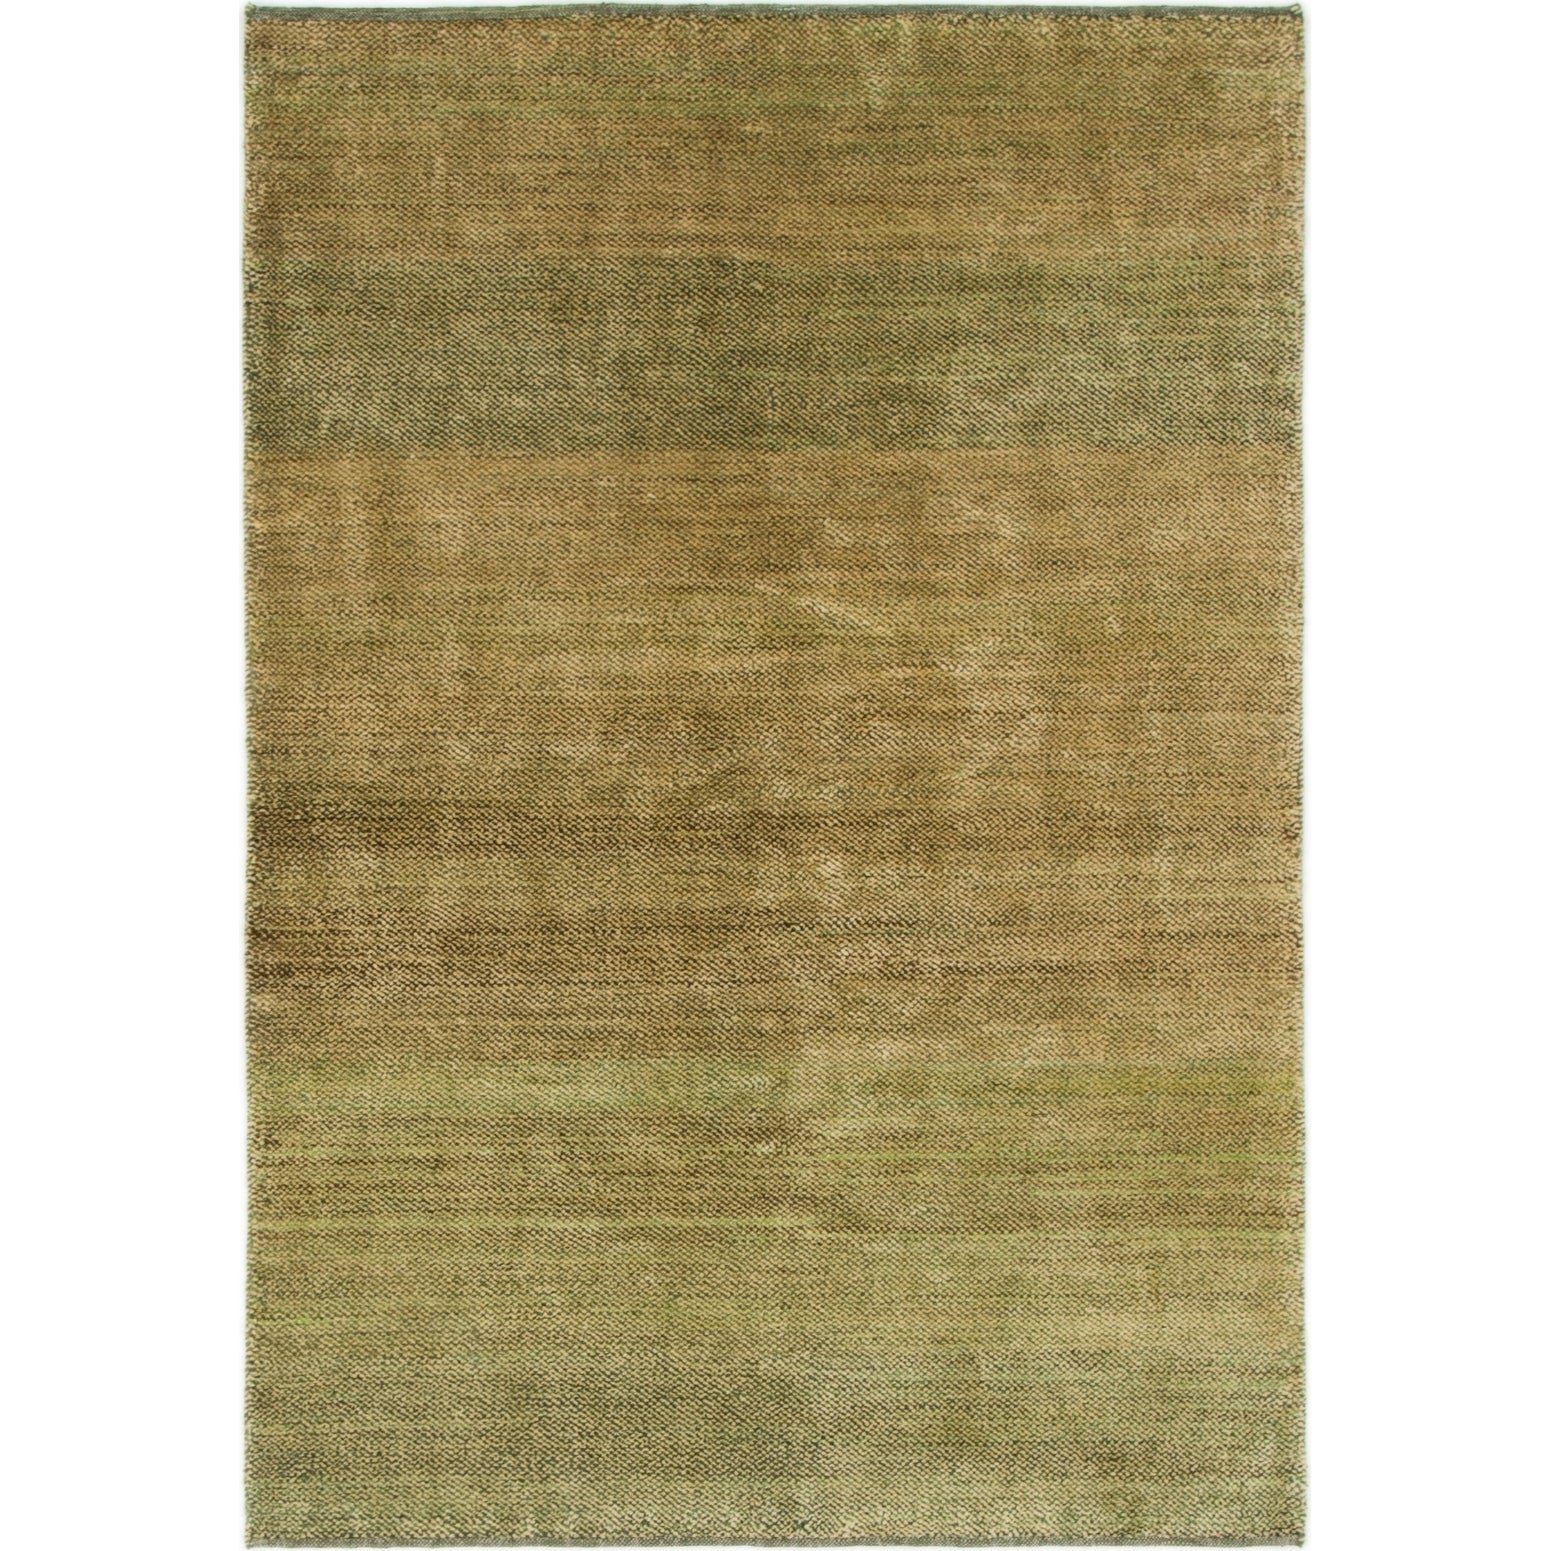 Hand Knotted Kashkuli Gabbeh Wool Area Rug - 3 10 x 5 9 (Green - 3 10 x 5 9)